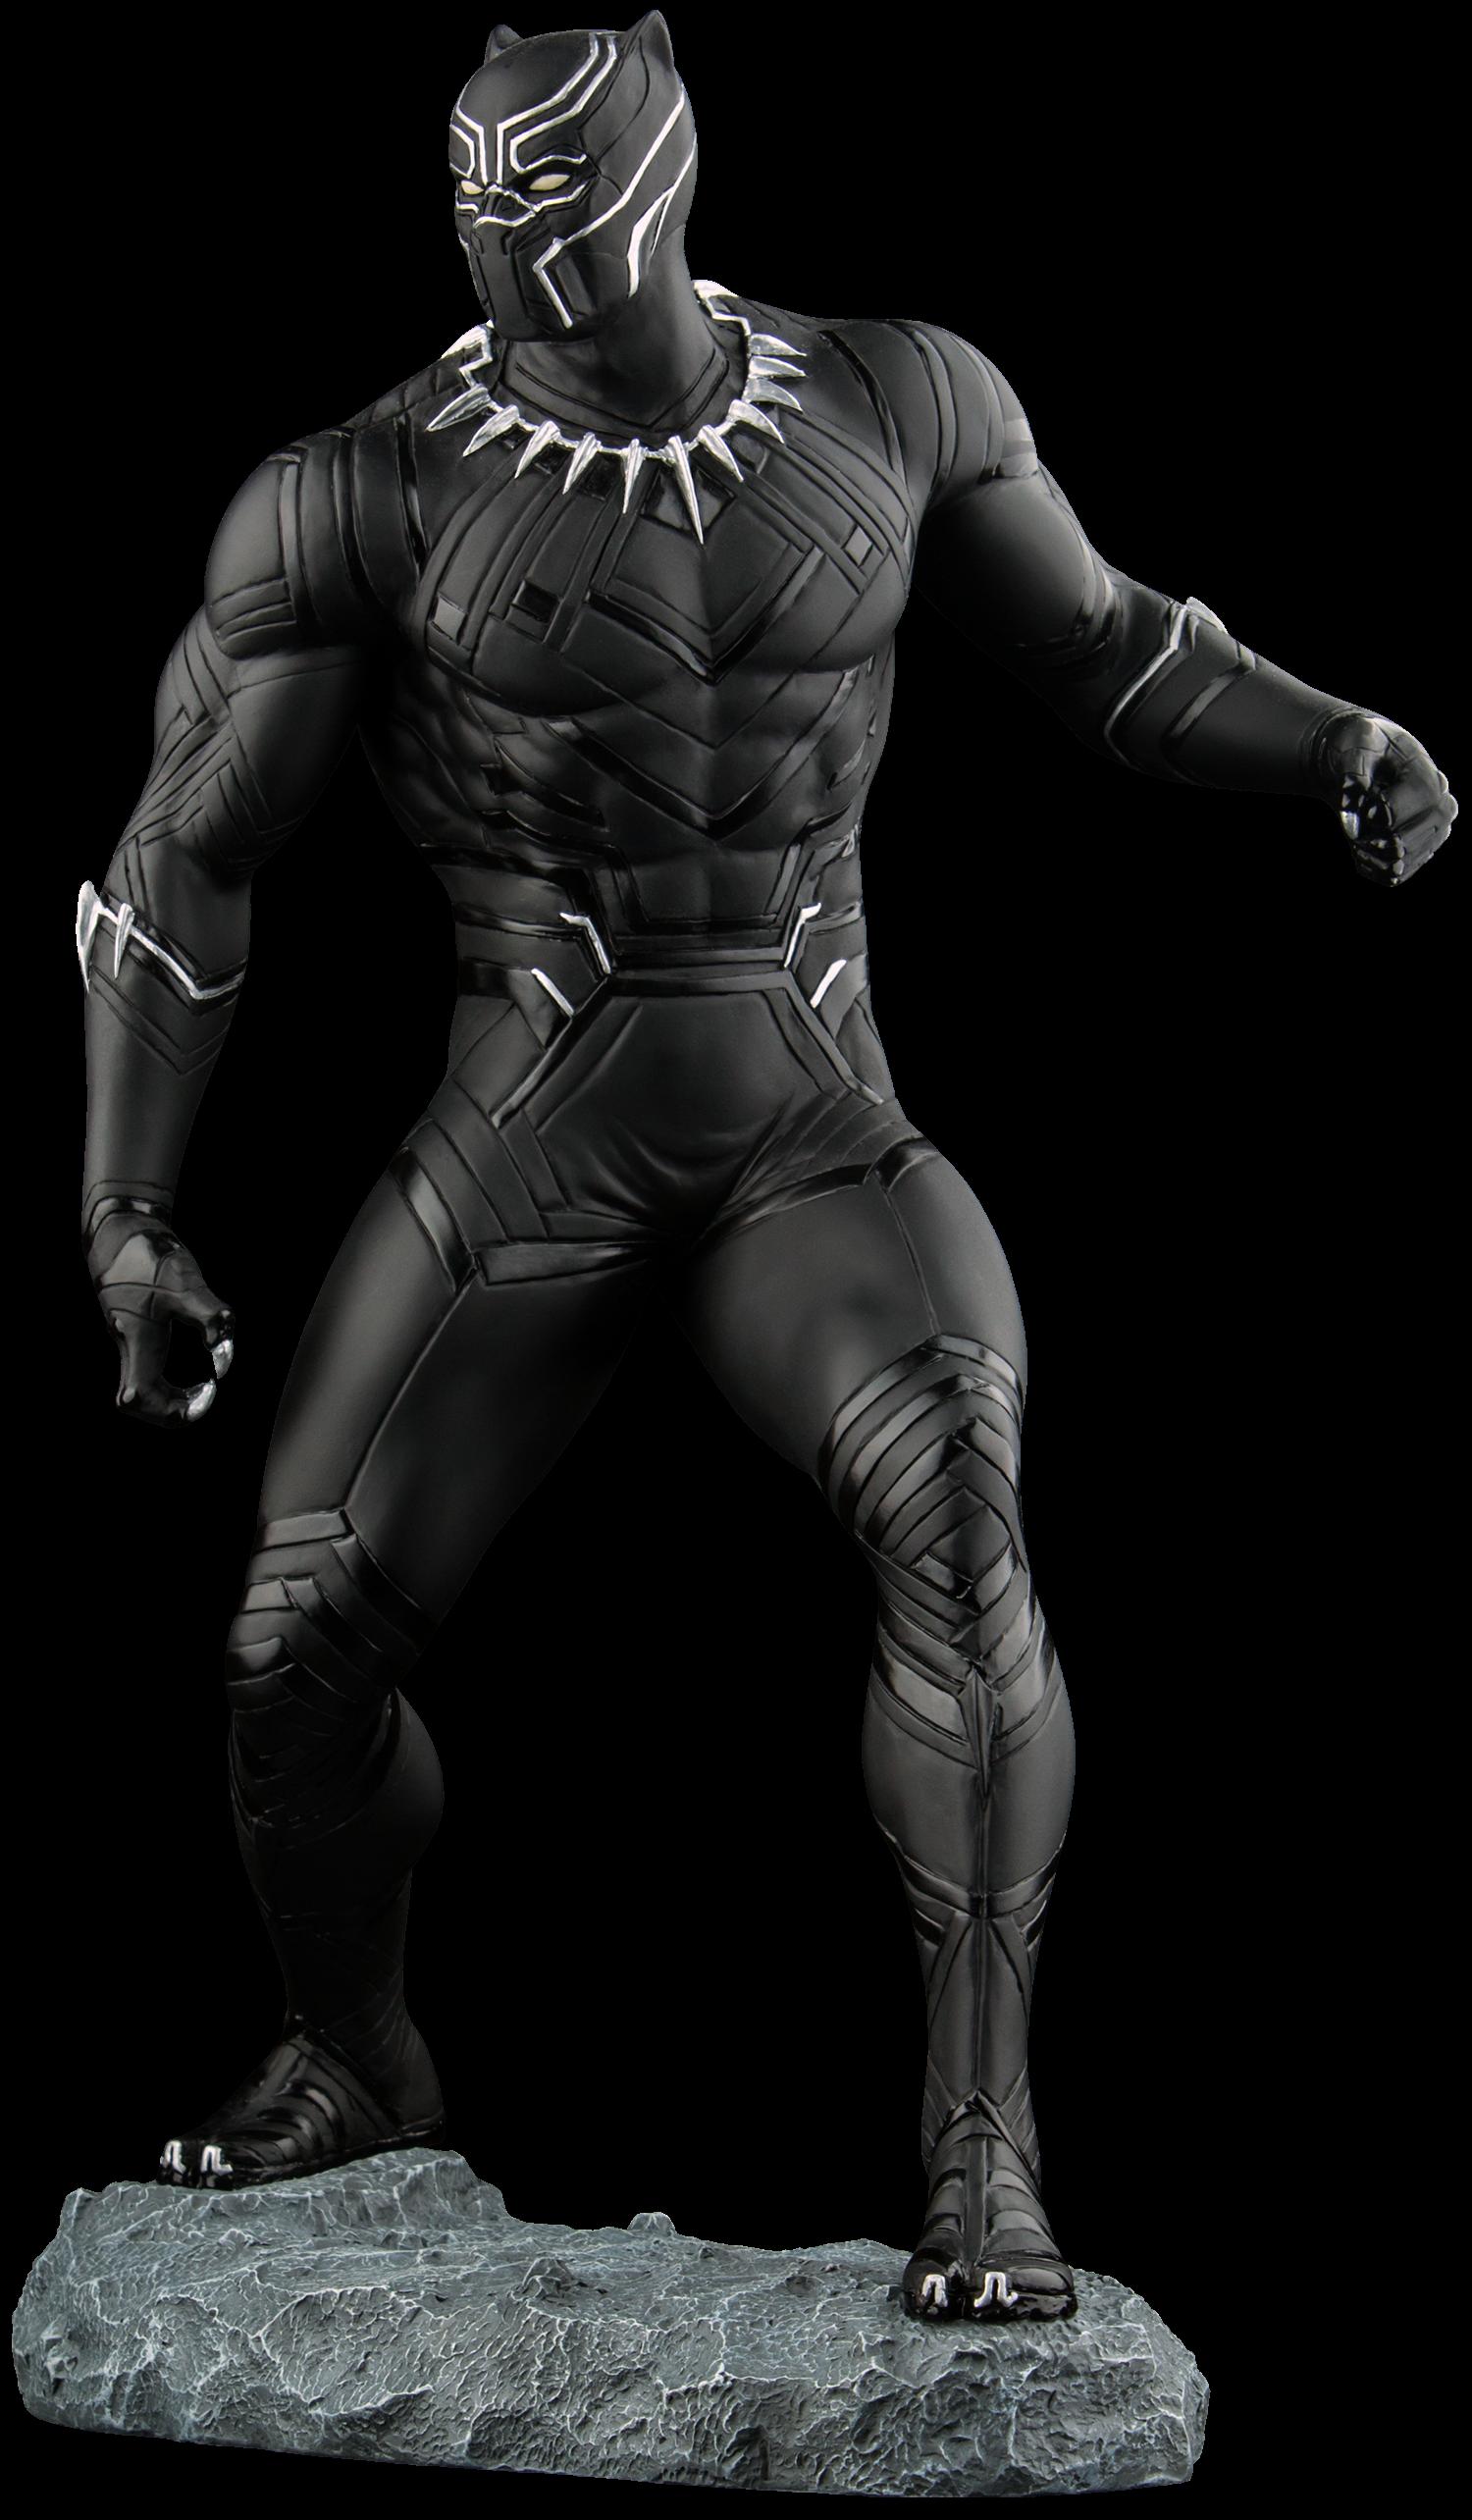 panth4.png (1500×2568) | Black panther marvel, Black ...